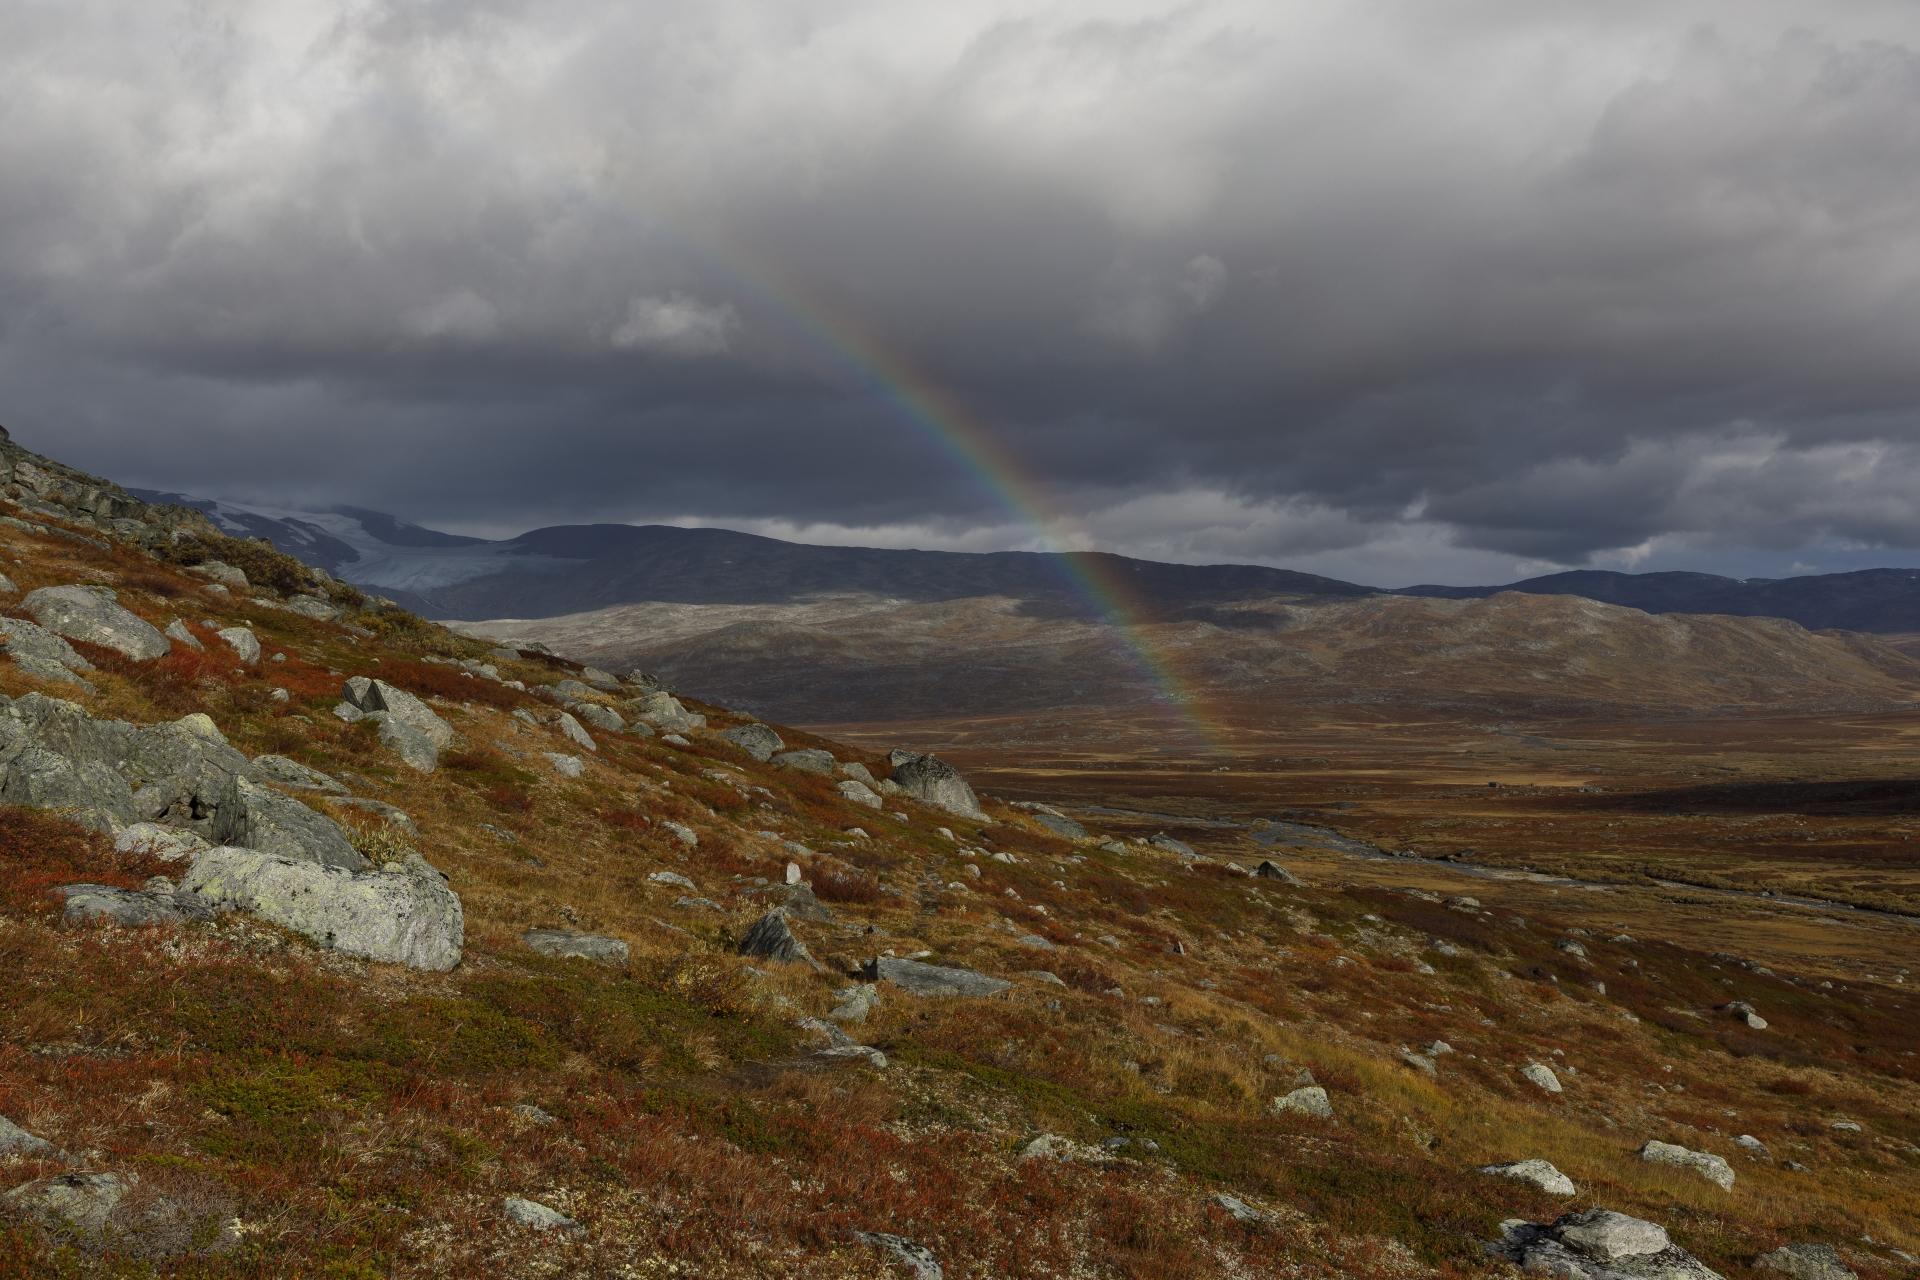 Čunovuopmi und links kurz sichtbar das Storsteinsfjellet bzw. der Sealggajiekna